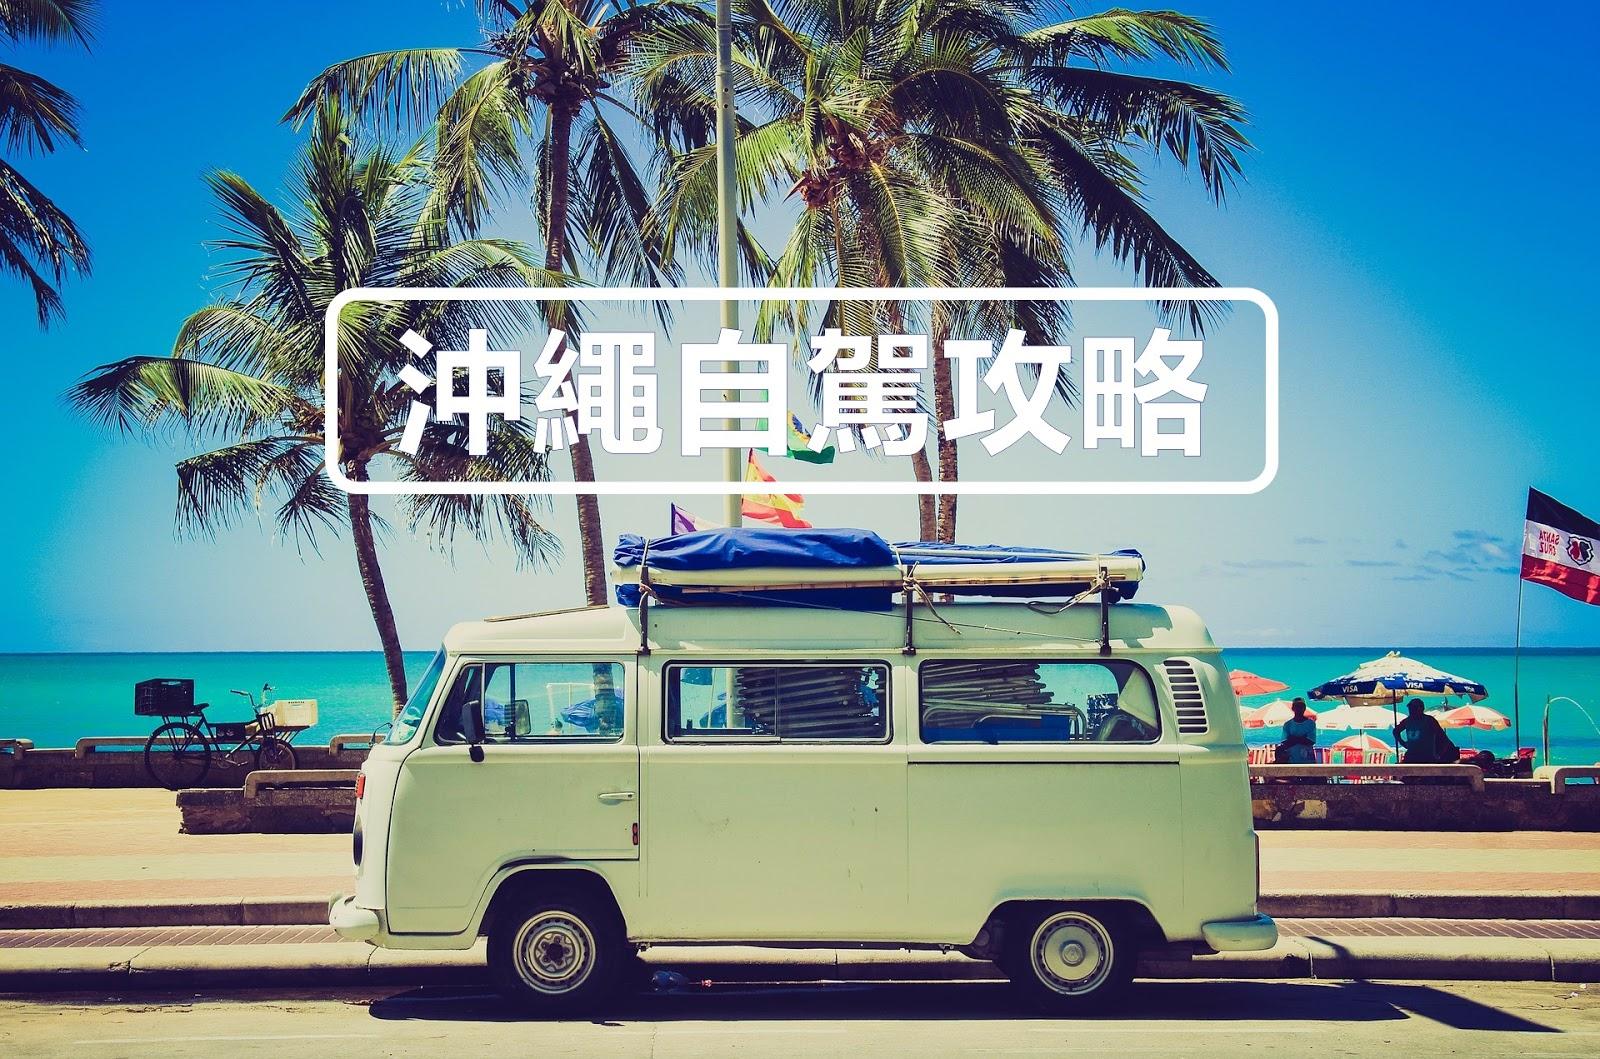 %25E6%25B2%2596%25E7%25B9%25A9-%25E8%2587%25AA%25E9%25A7%2595-%25E7%25A7%259F%25E8%25BB%258A-%25E6%258E%25A8%25E8%2596%25A6-%25E5%2585%25AC%25E5%258F%25B8-Okinawa-rental-car-2-沖繩-租車-自駕-推薦-比價